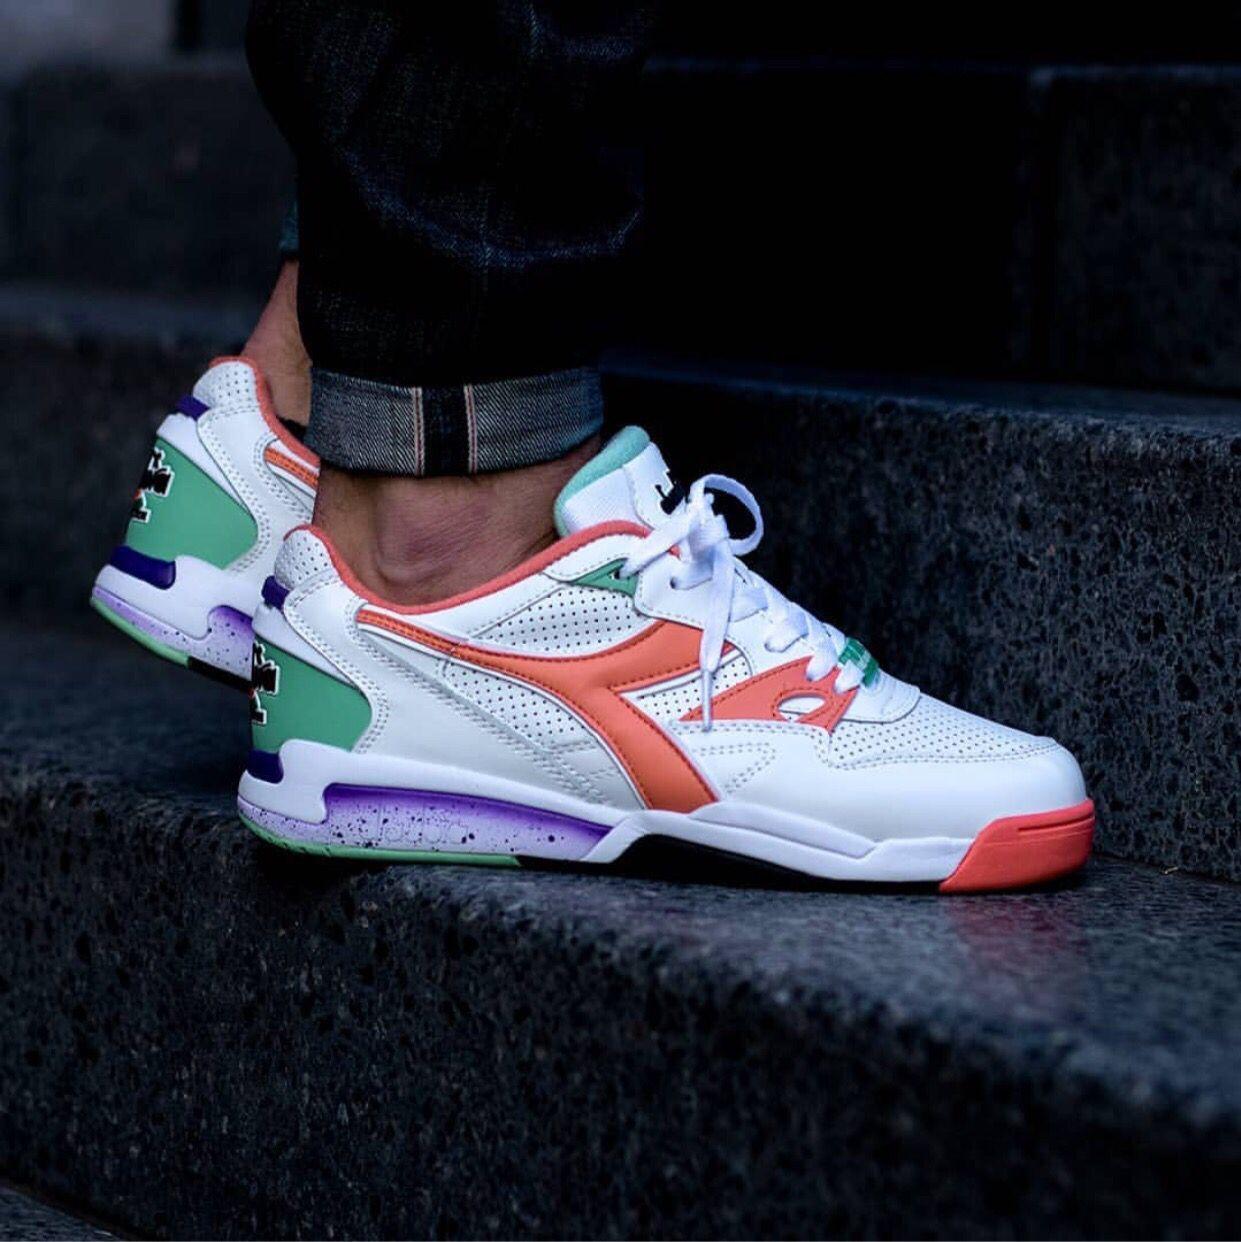 Diadora Werkschoenen Dealer.Diadora Rebound Ace Off White Airmax In 2019 Sneakers Fashion